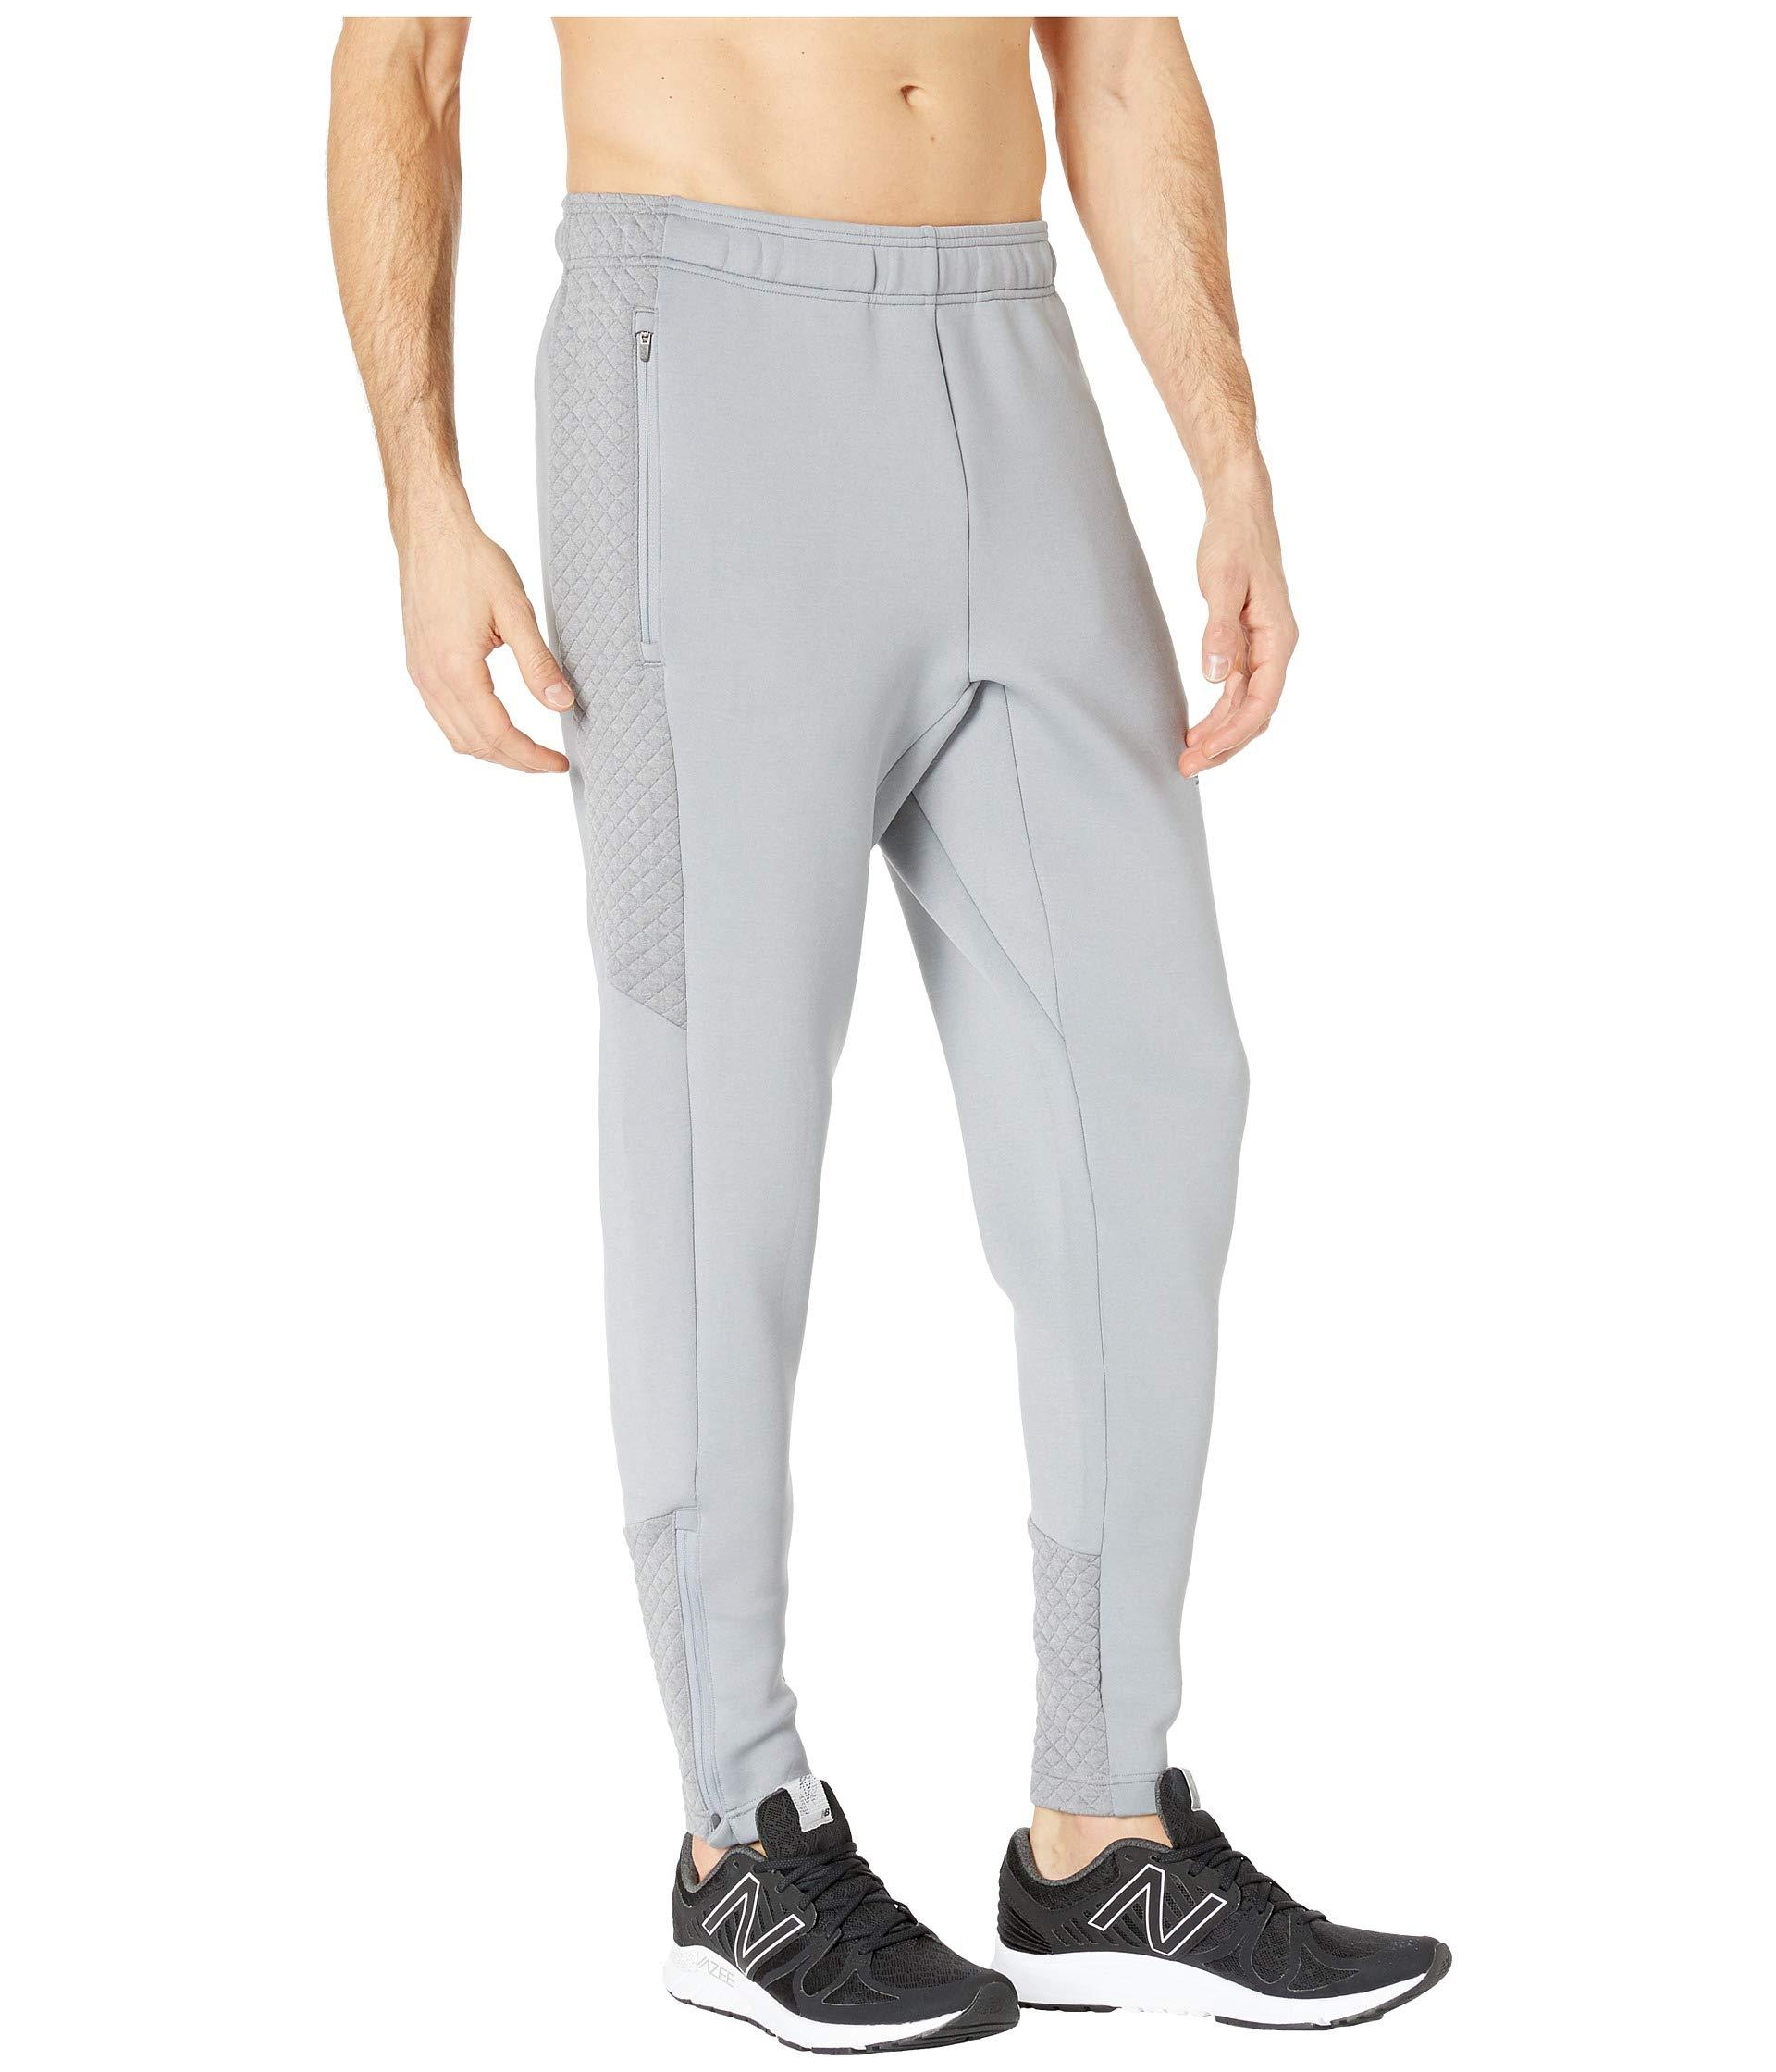 Nb Balance Grey Athletic Loft New Pants Heat g547wq